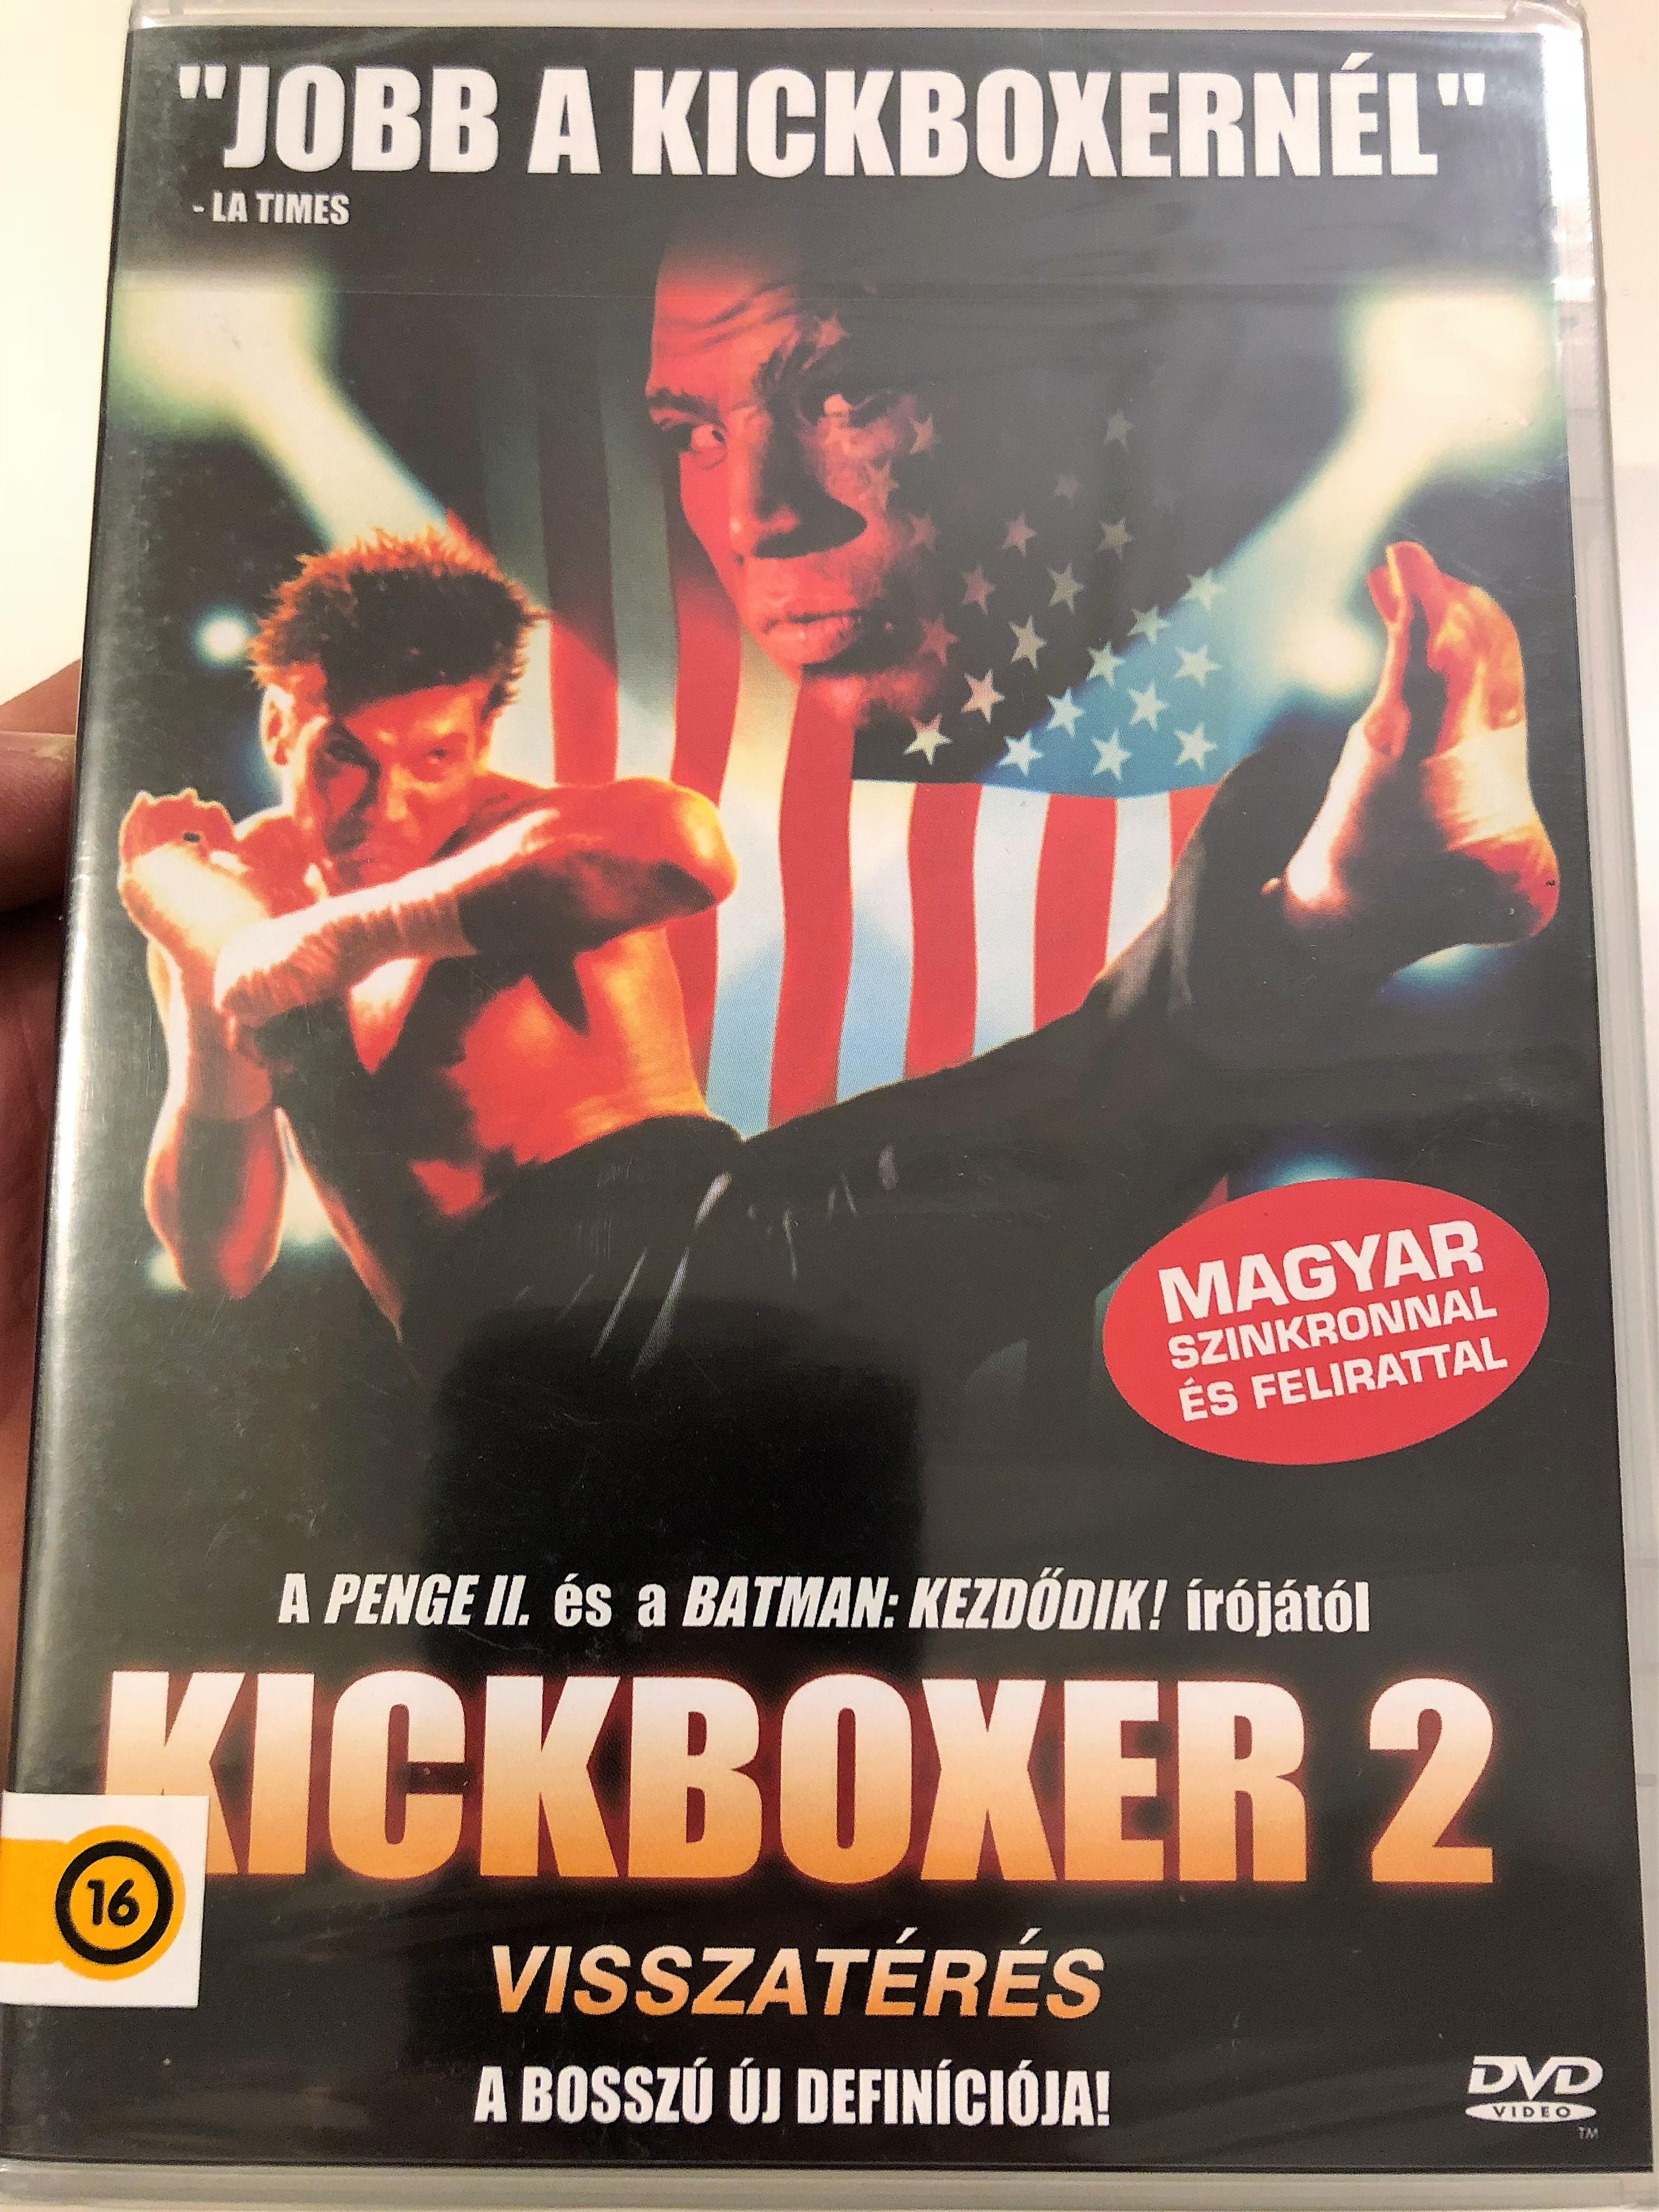 kickboxer-2-the-road-back-dvd-1991-kickboxer-2-visszat-r-s-directed-by-albert-pyun-starring-sasha-mitchell-peter-boyle-dennis-chan-cary-hiroyuki-tagawa-john-diehl-michel-qissi-1-.jpg